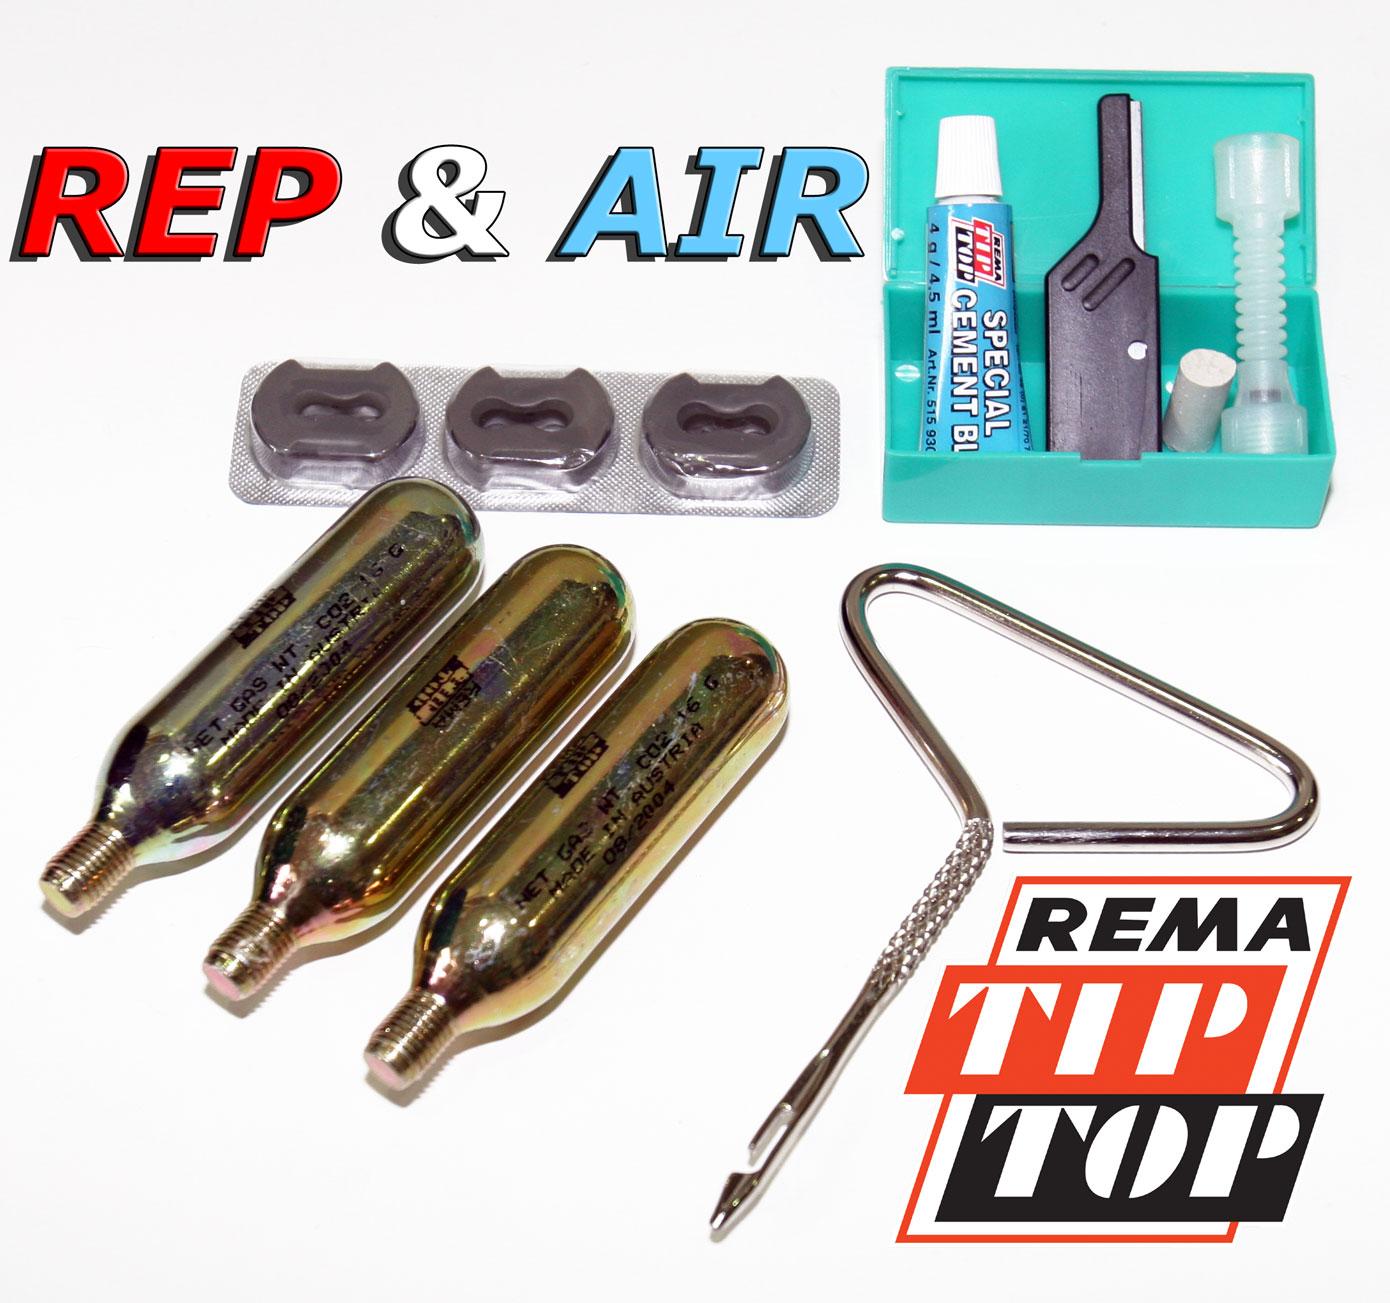 design innovativo 4efcc 13345 Rep & Air originale Rema Tip Top, kit riparazione pneumatici tubeless